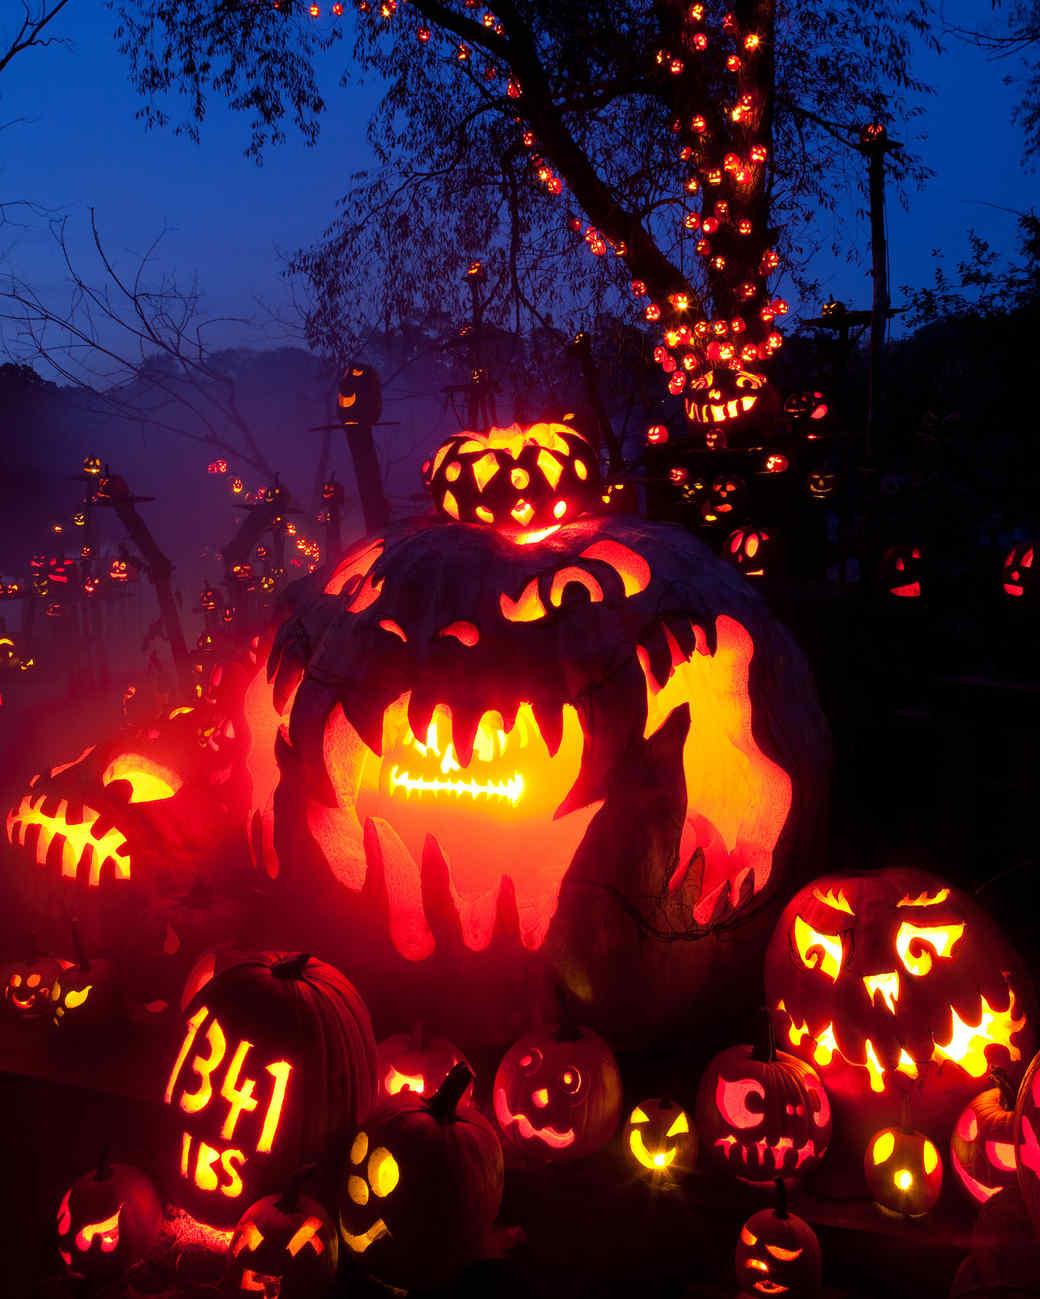 jack-o-lantern night display pumpkin festival